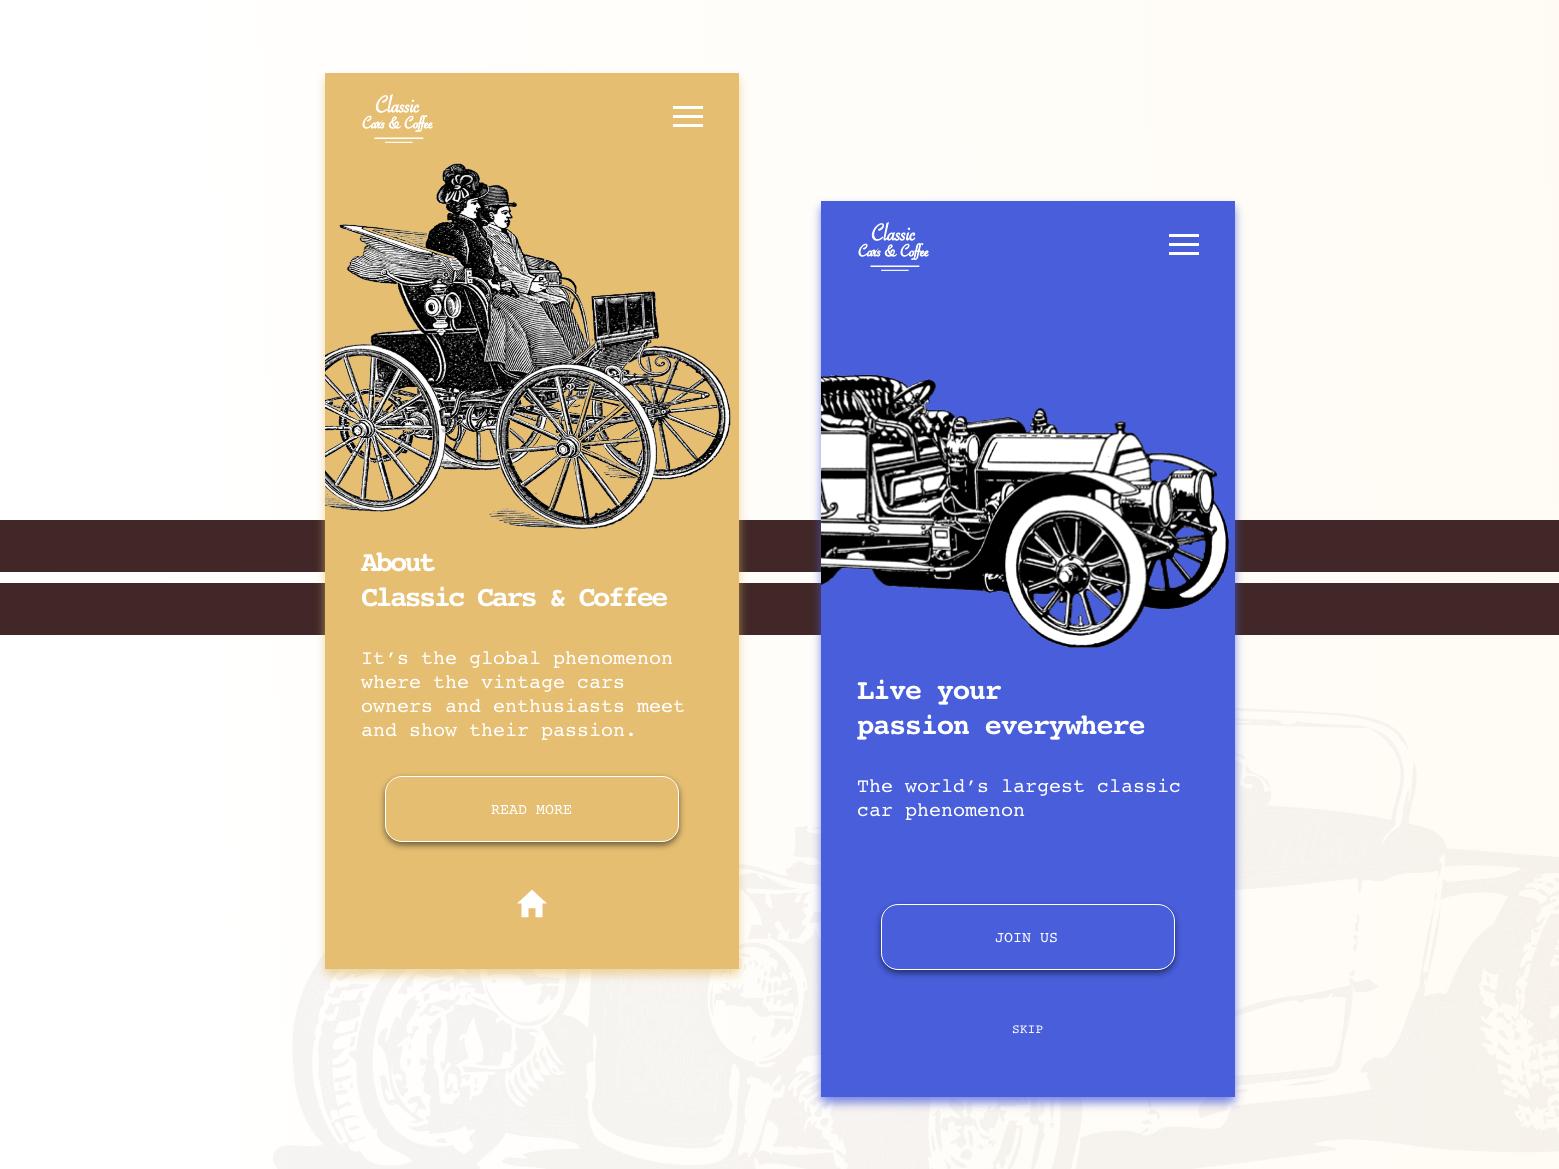 Vintage cars & coffee app blue yellow simple classy cars classic vintage ux vector ui concept design app